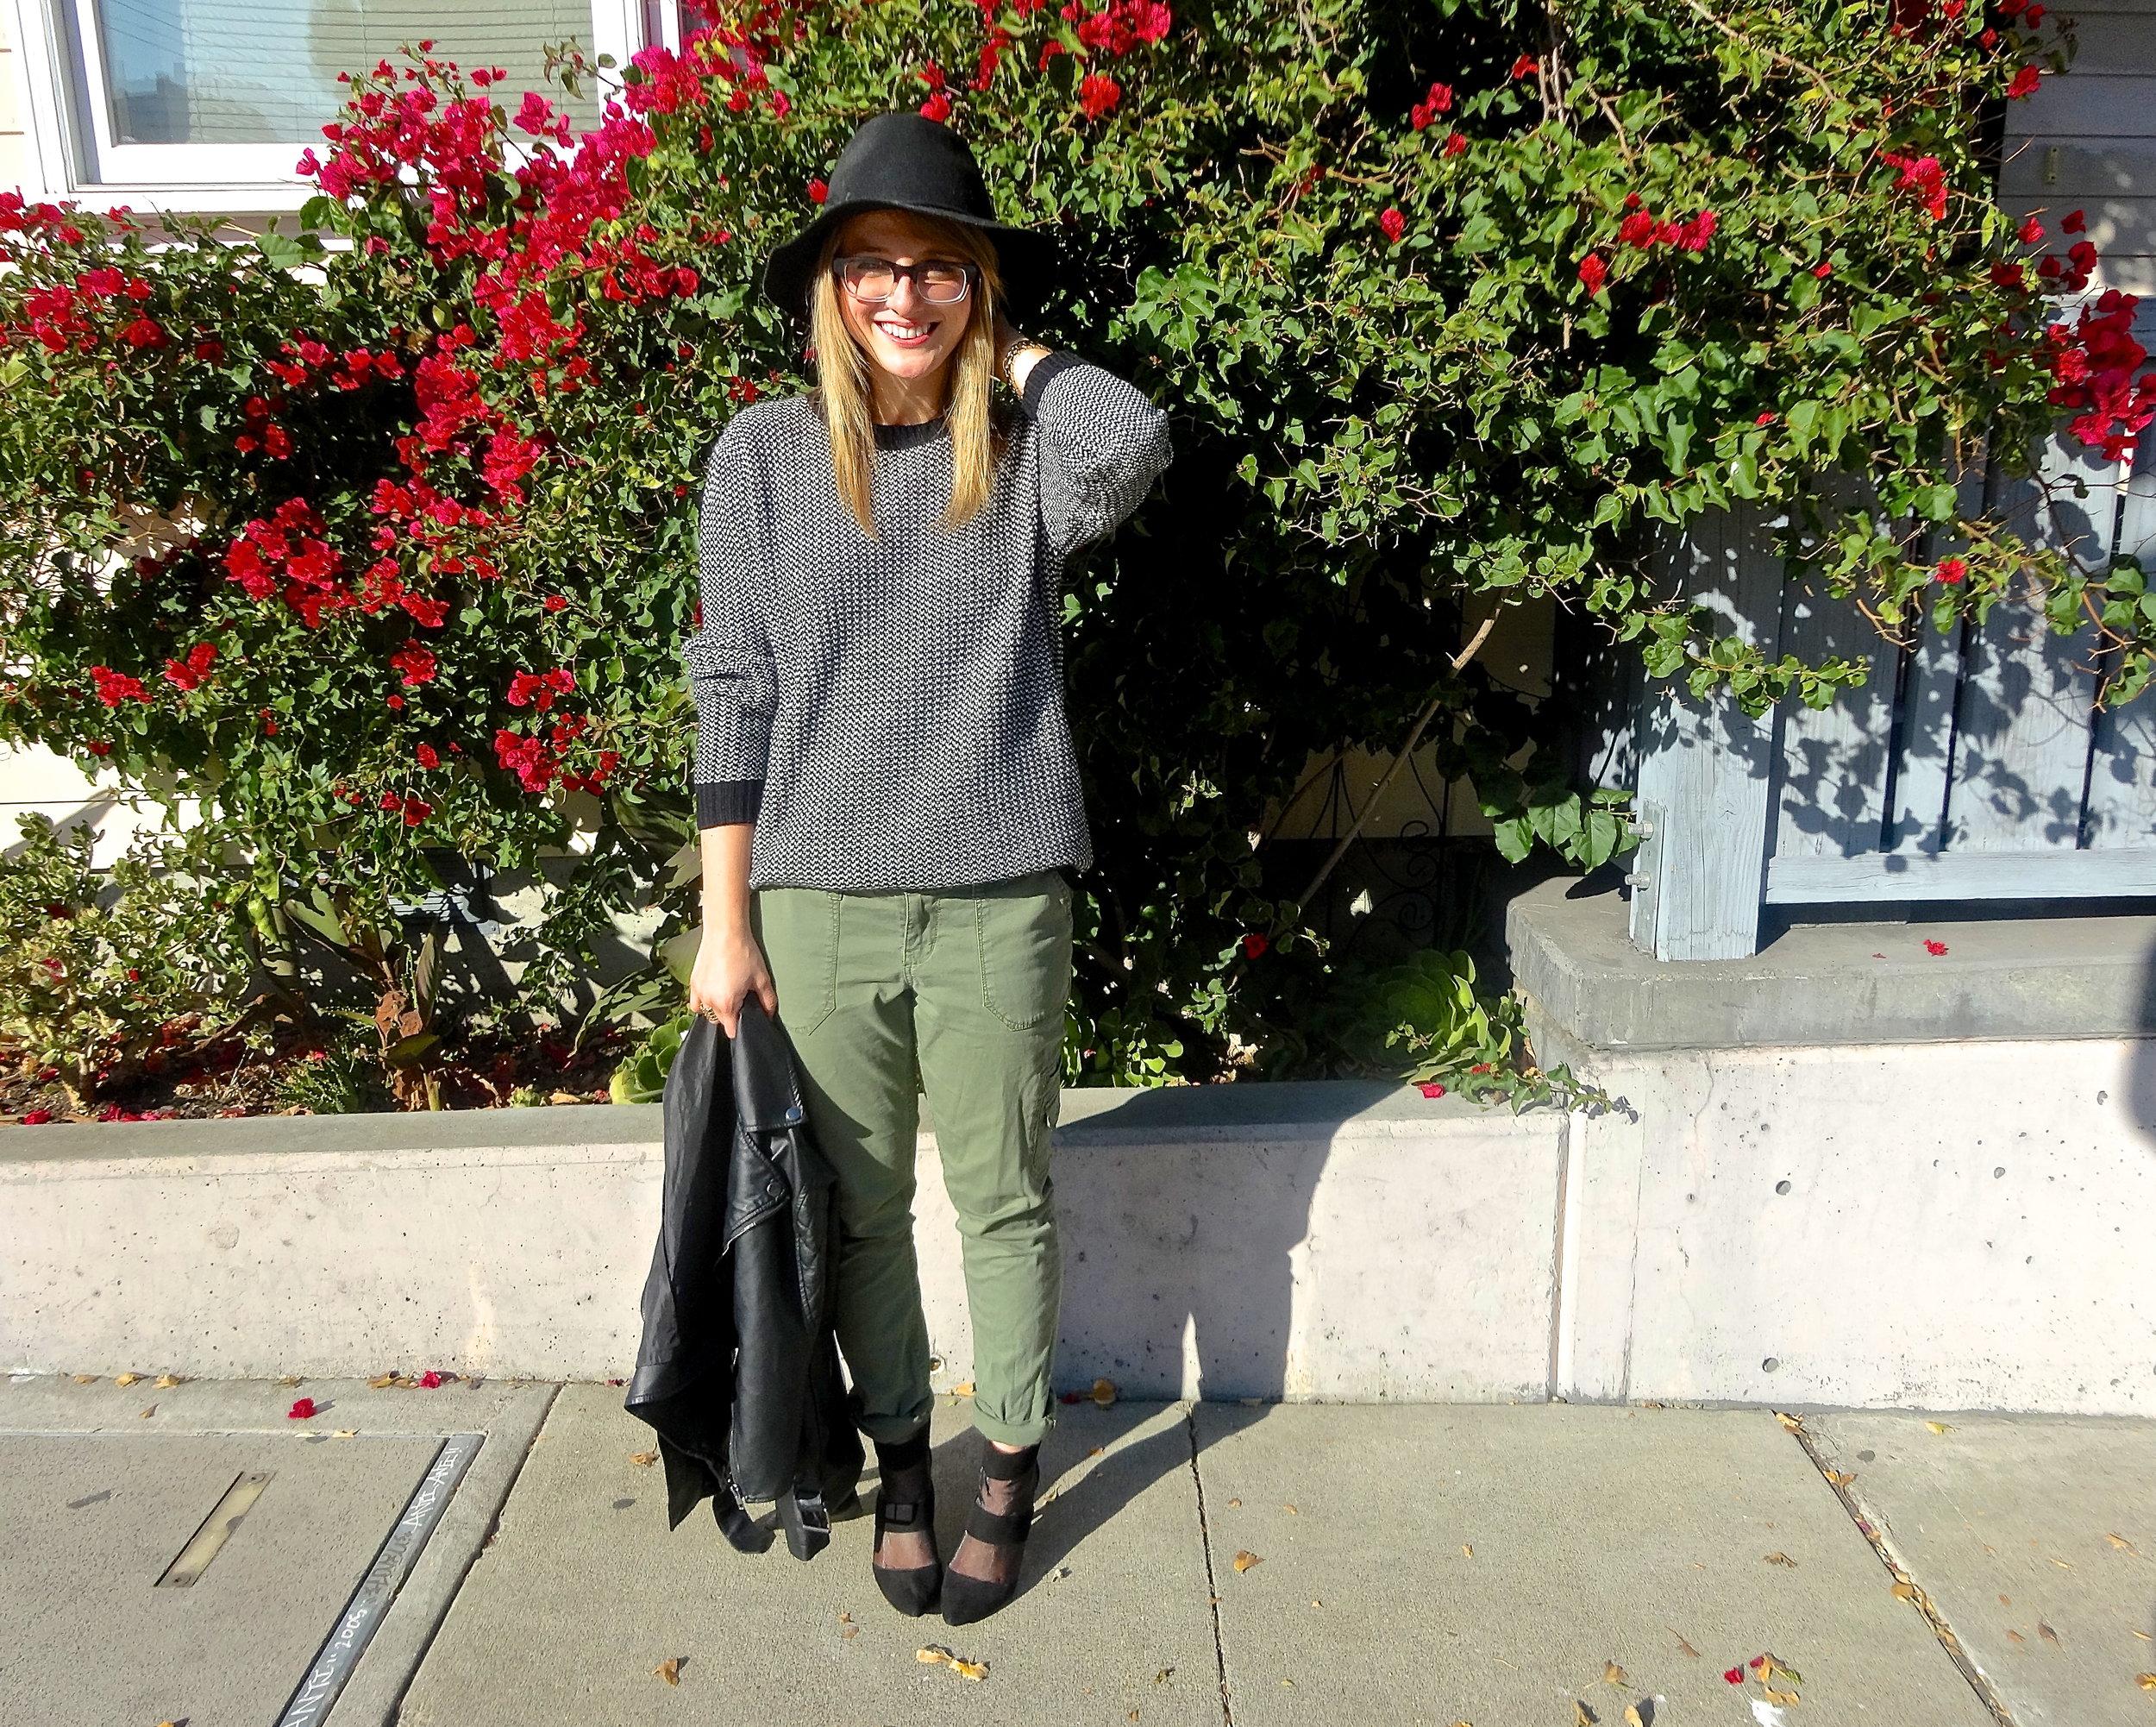 Sweater: F21 | Pants: Target | Hat: Target | Jacket: Bar III | Heels: Zara